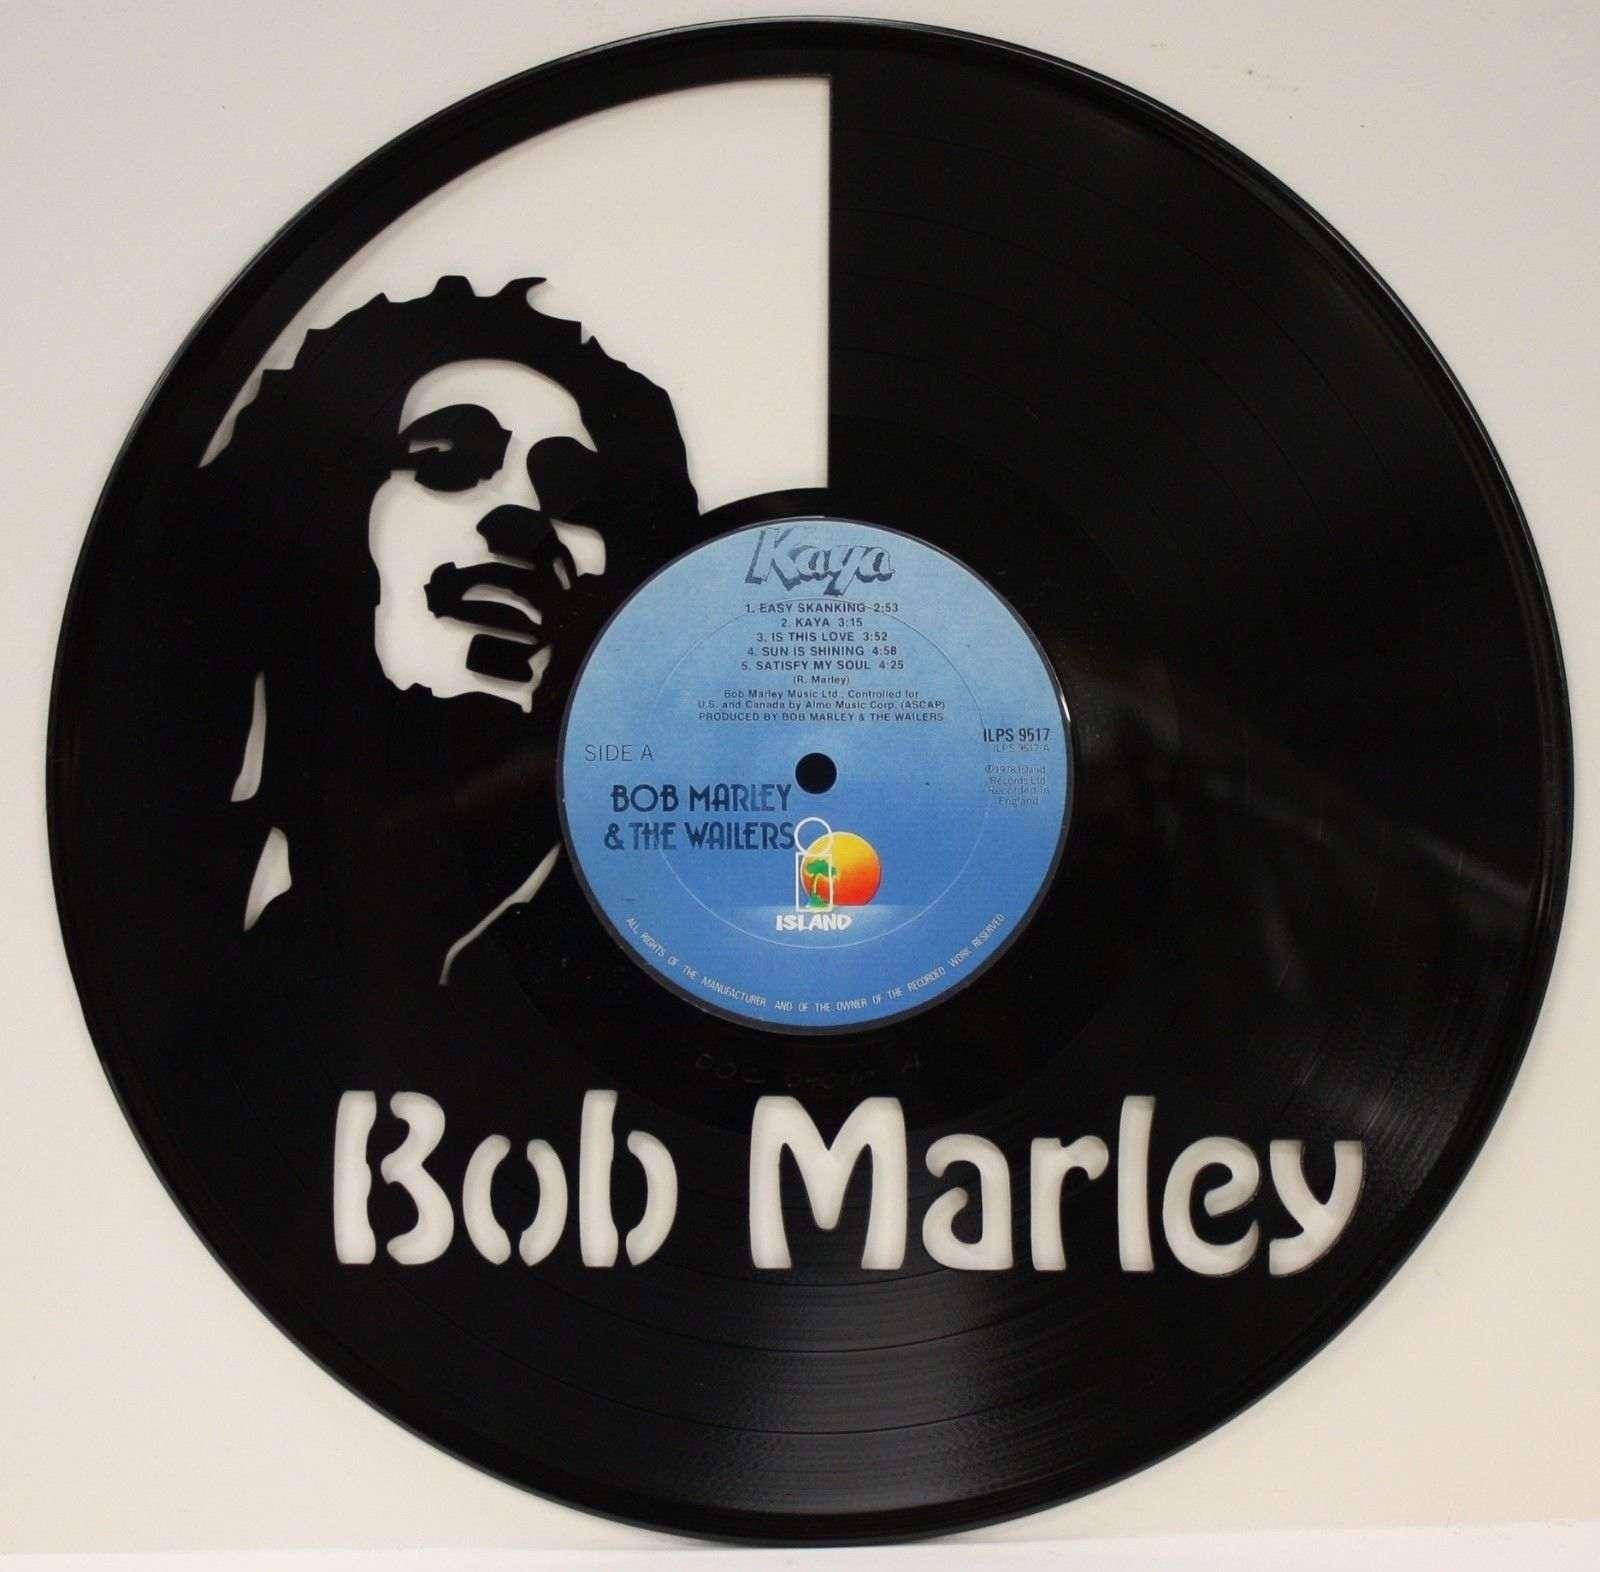 bob marley vinyl lp record laser cut wall art display gold record awards album and disc. Black Bedroom Furniture Sets. Home Design Ideas